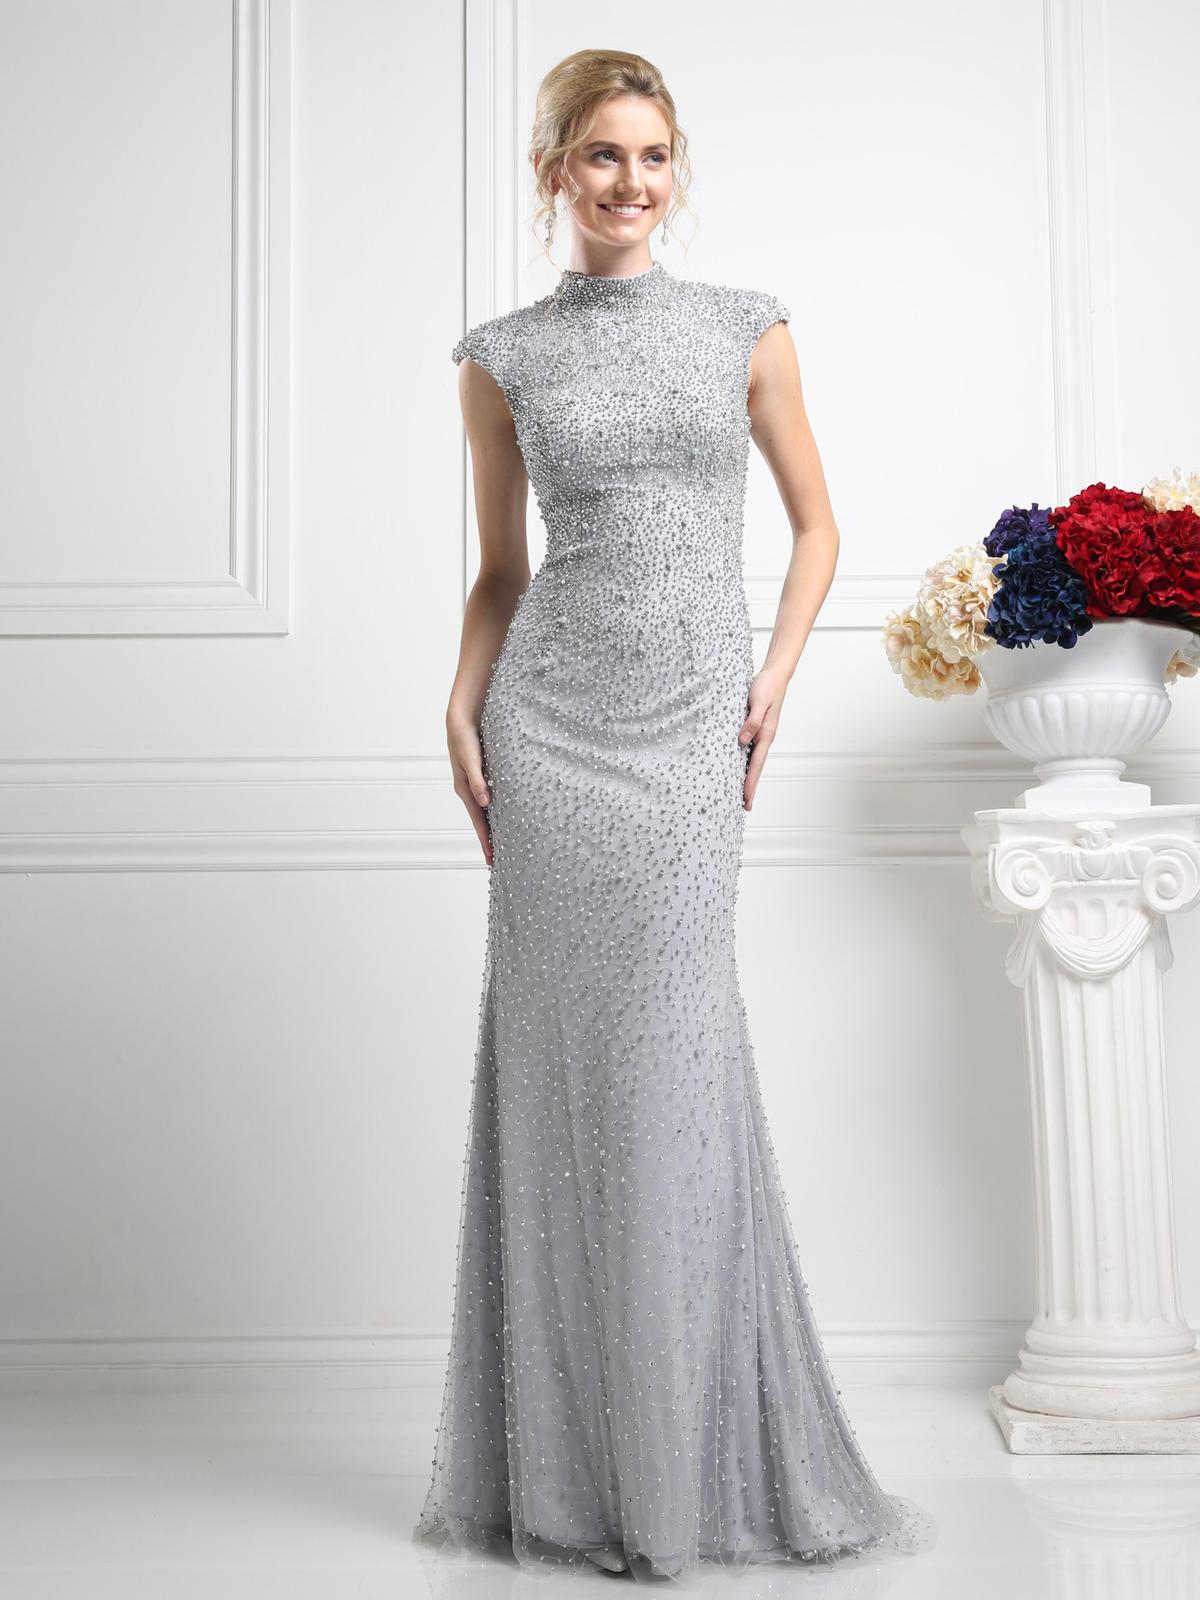 Long Beaded Evening Dress | Sung Boutique L.A.